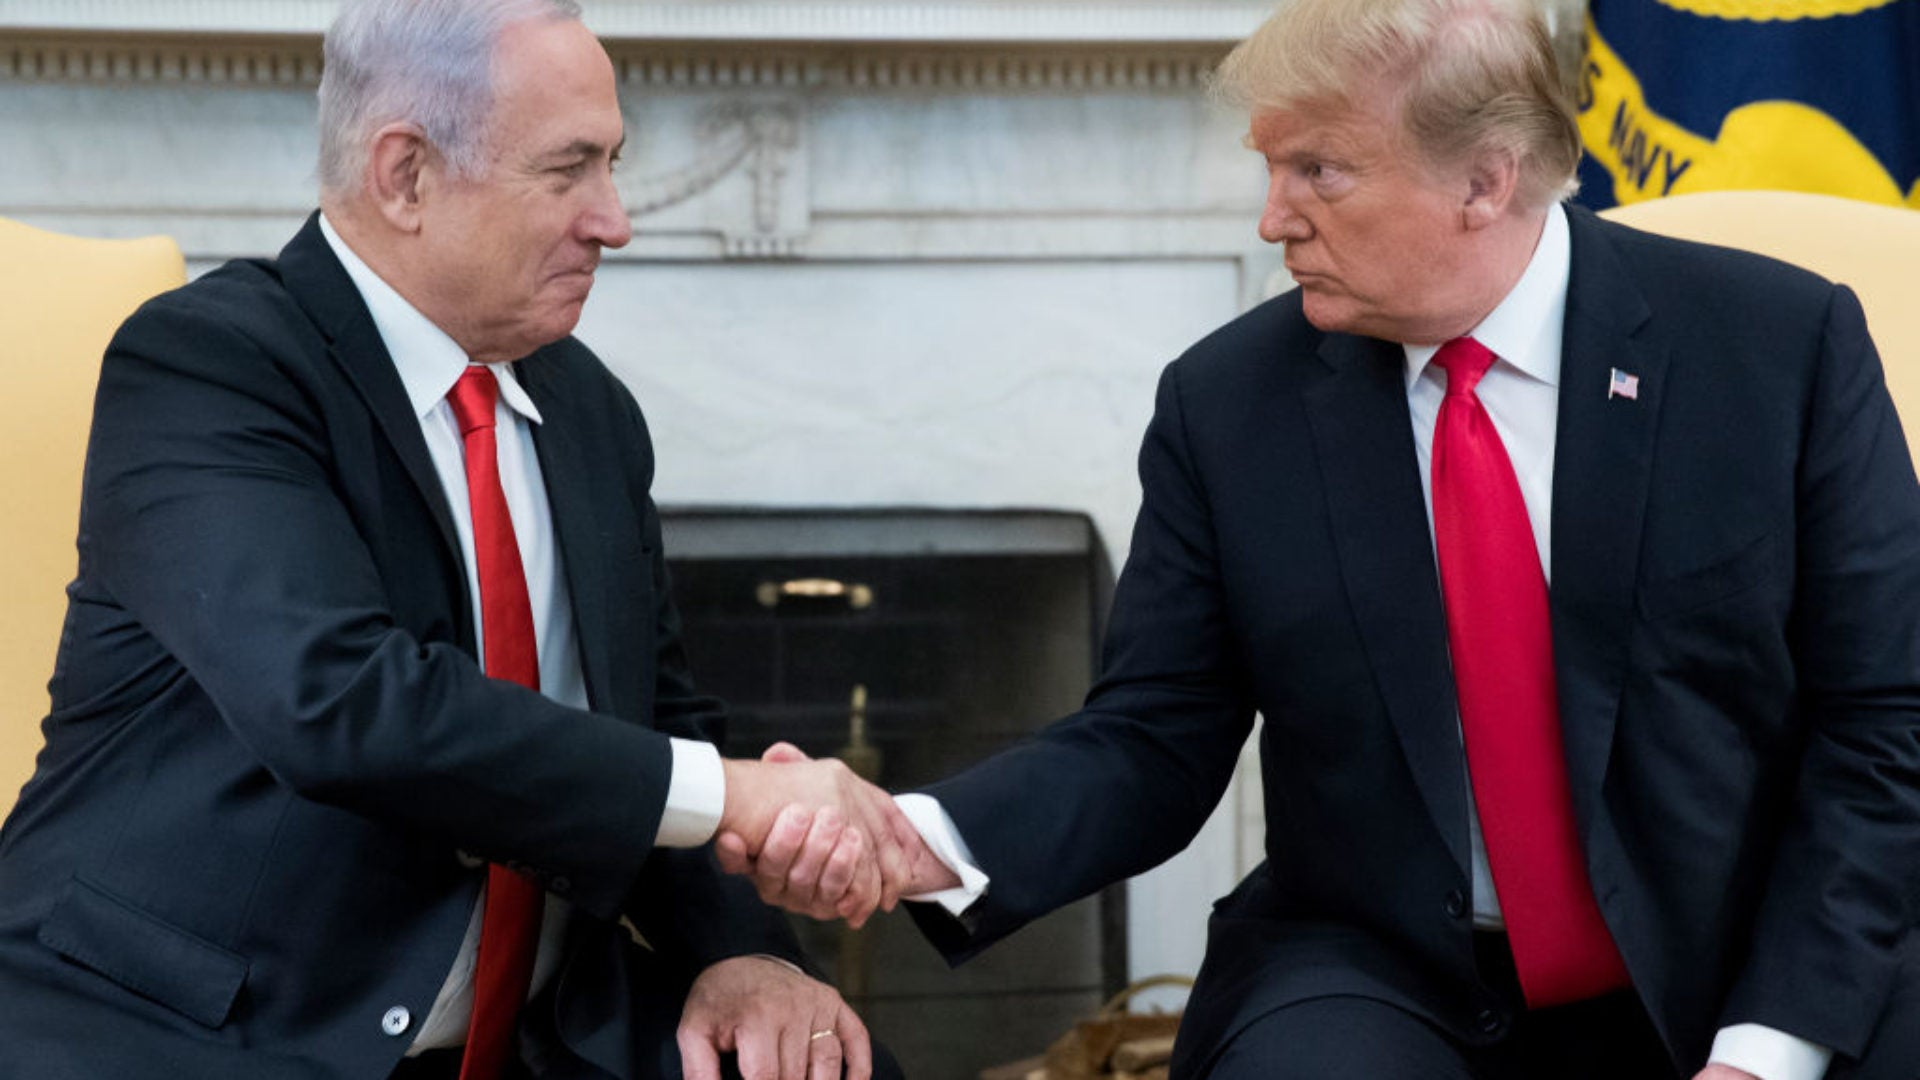 Opinion: Israel Blocks Reps. Ilhan Omar, Rashida Tlaib Visit After Trump Pressure, Prepare For Democrats' Political Theater